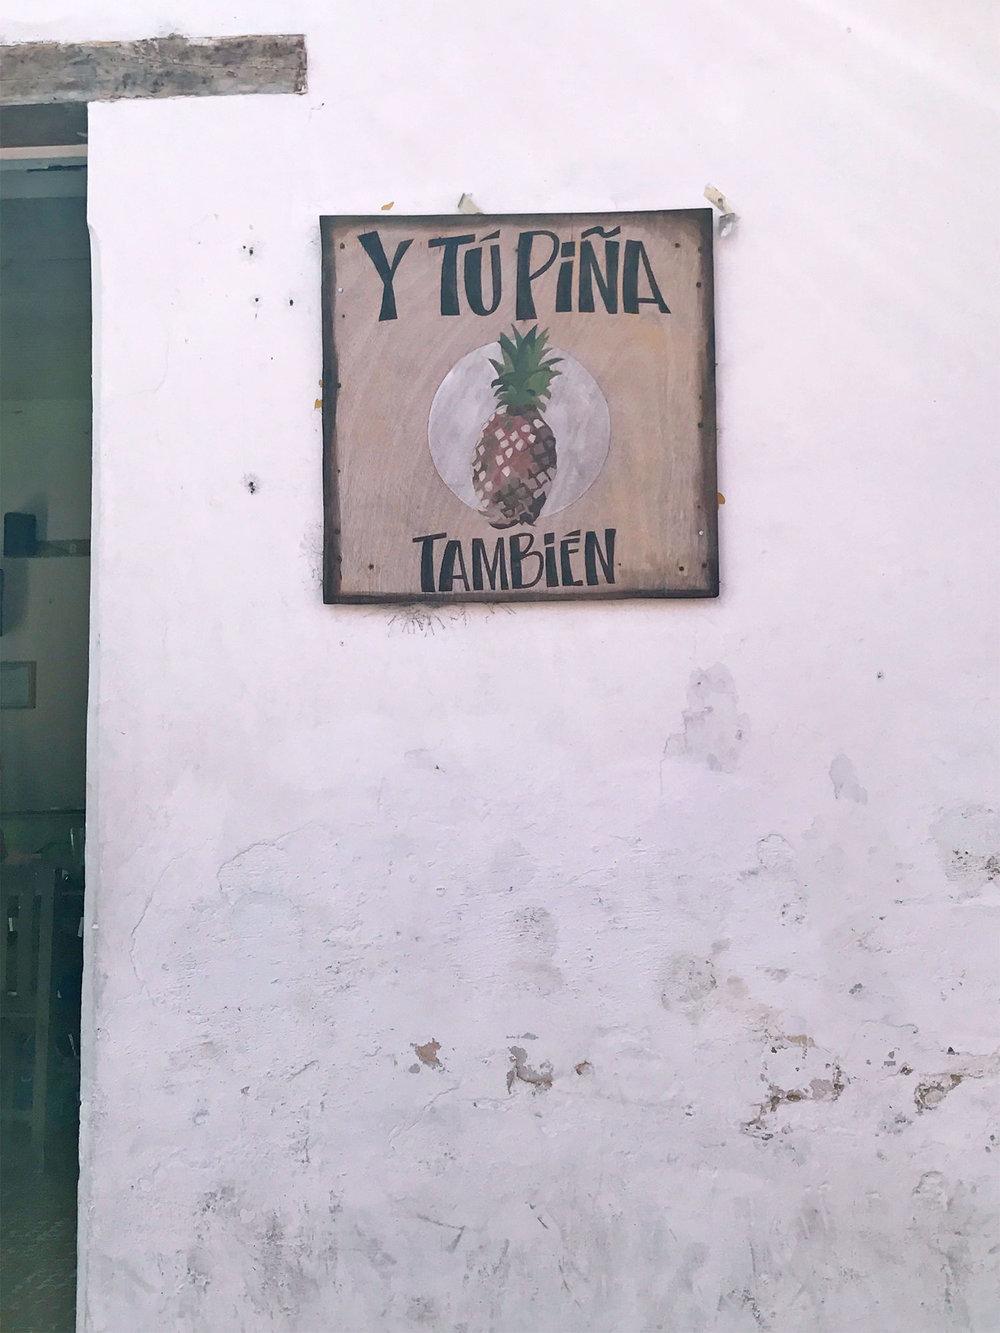 cafes in Antigua Guatemala